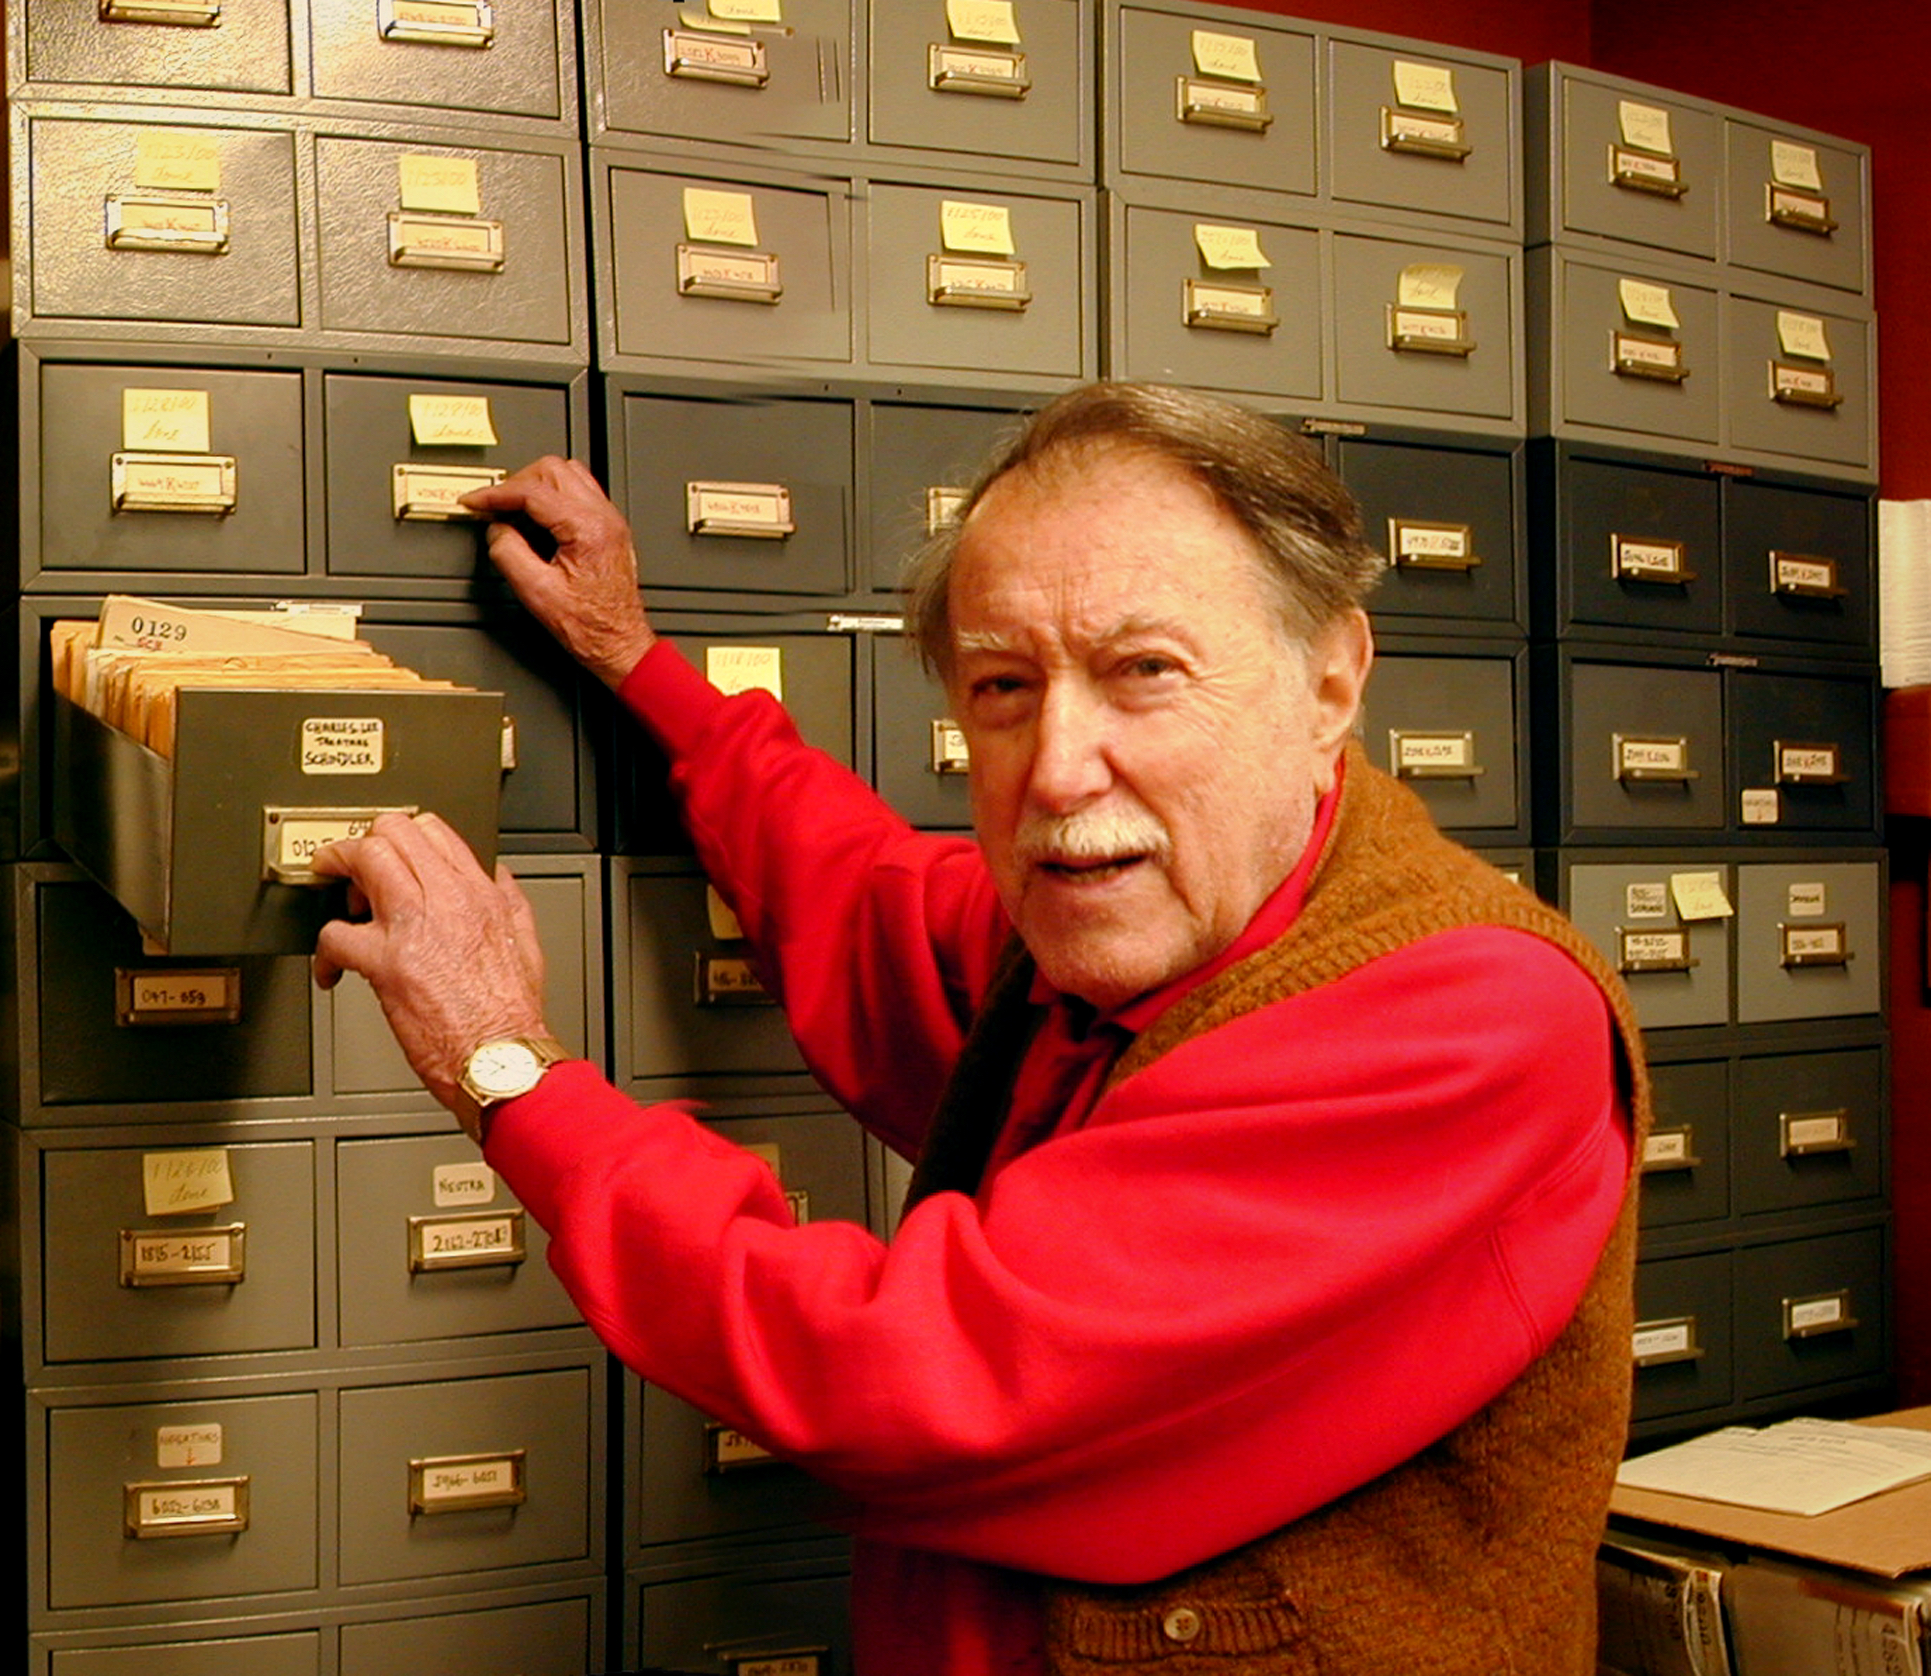 Julius Shulman in his archive.